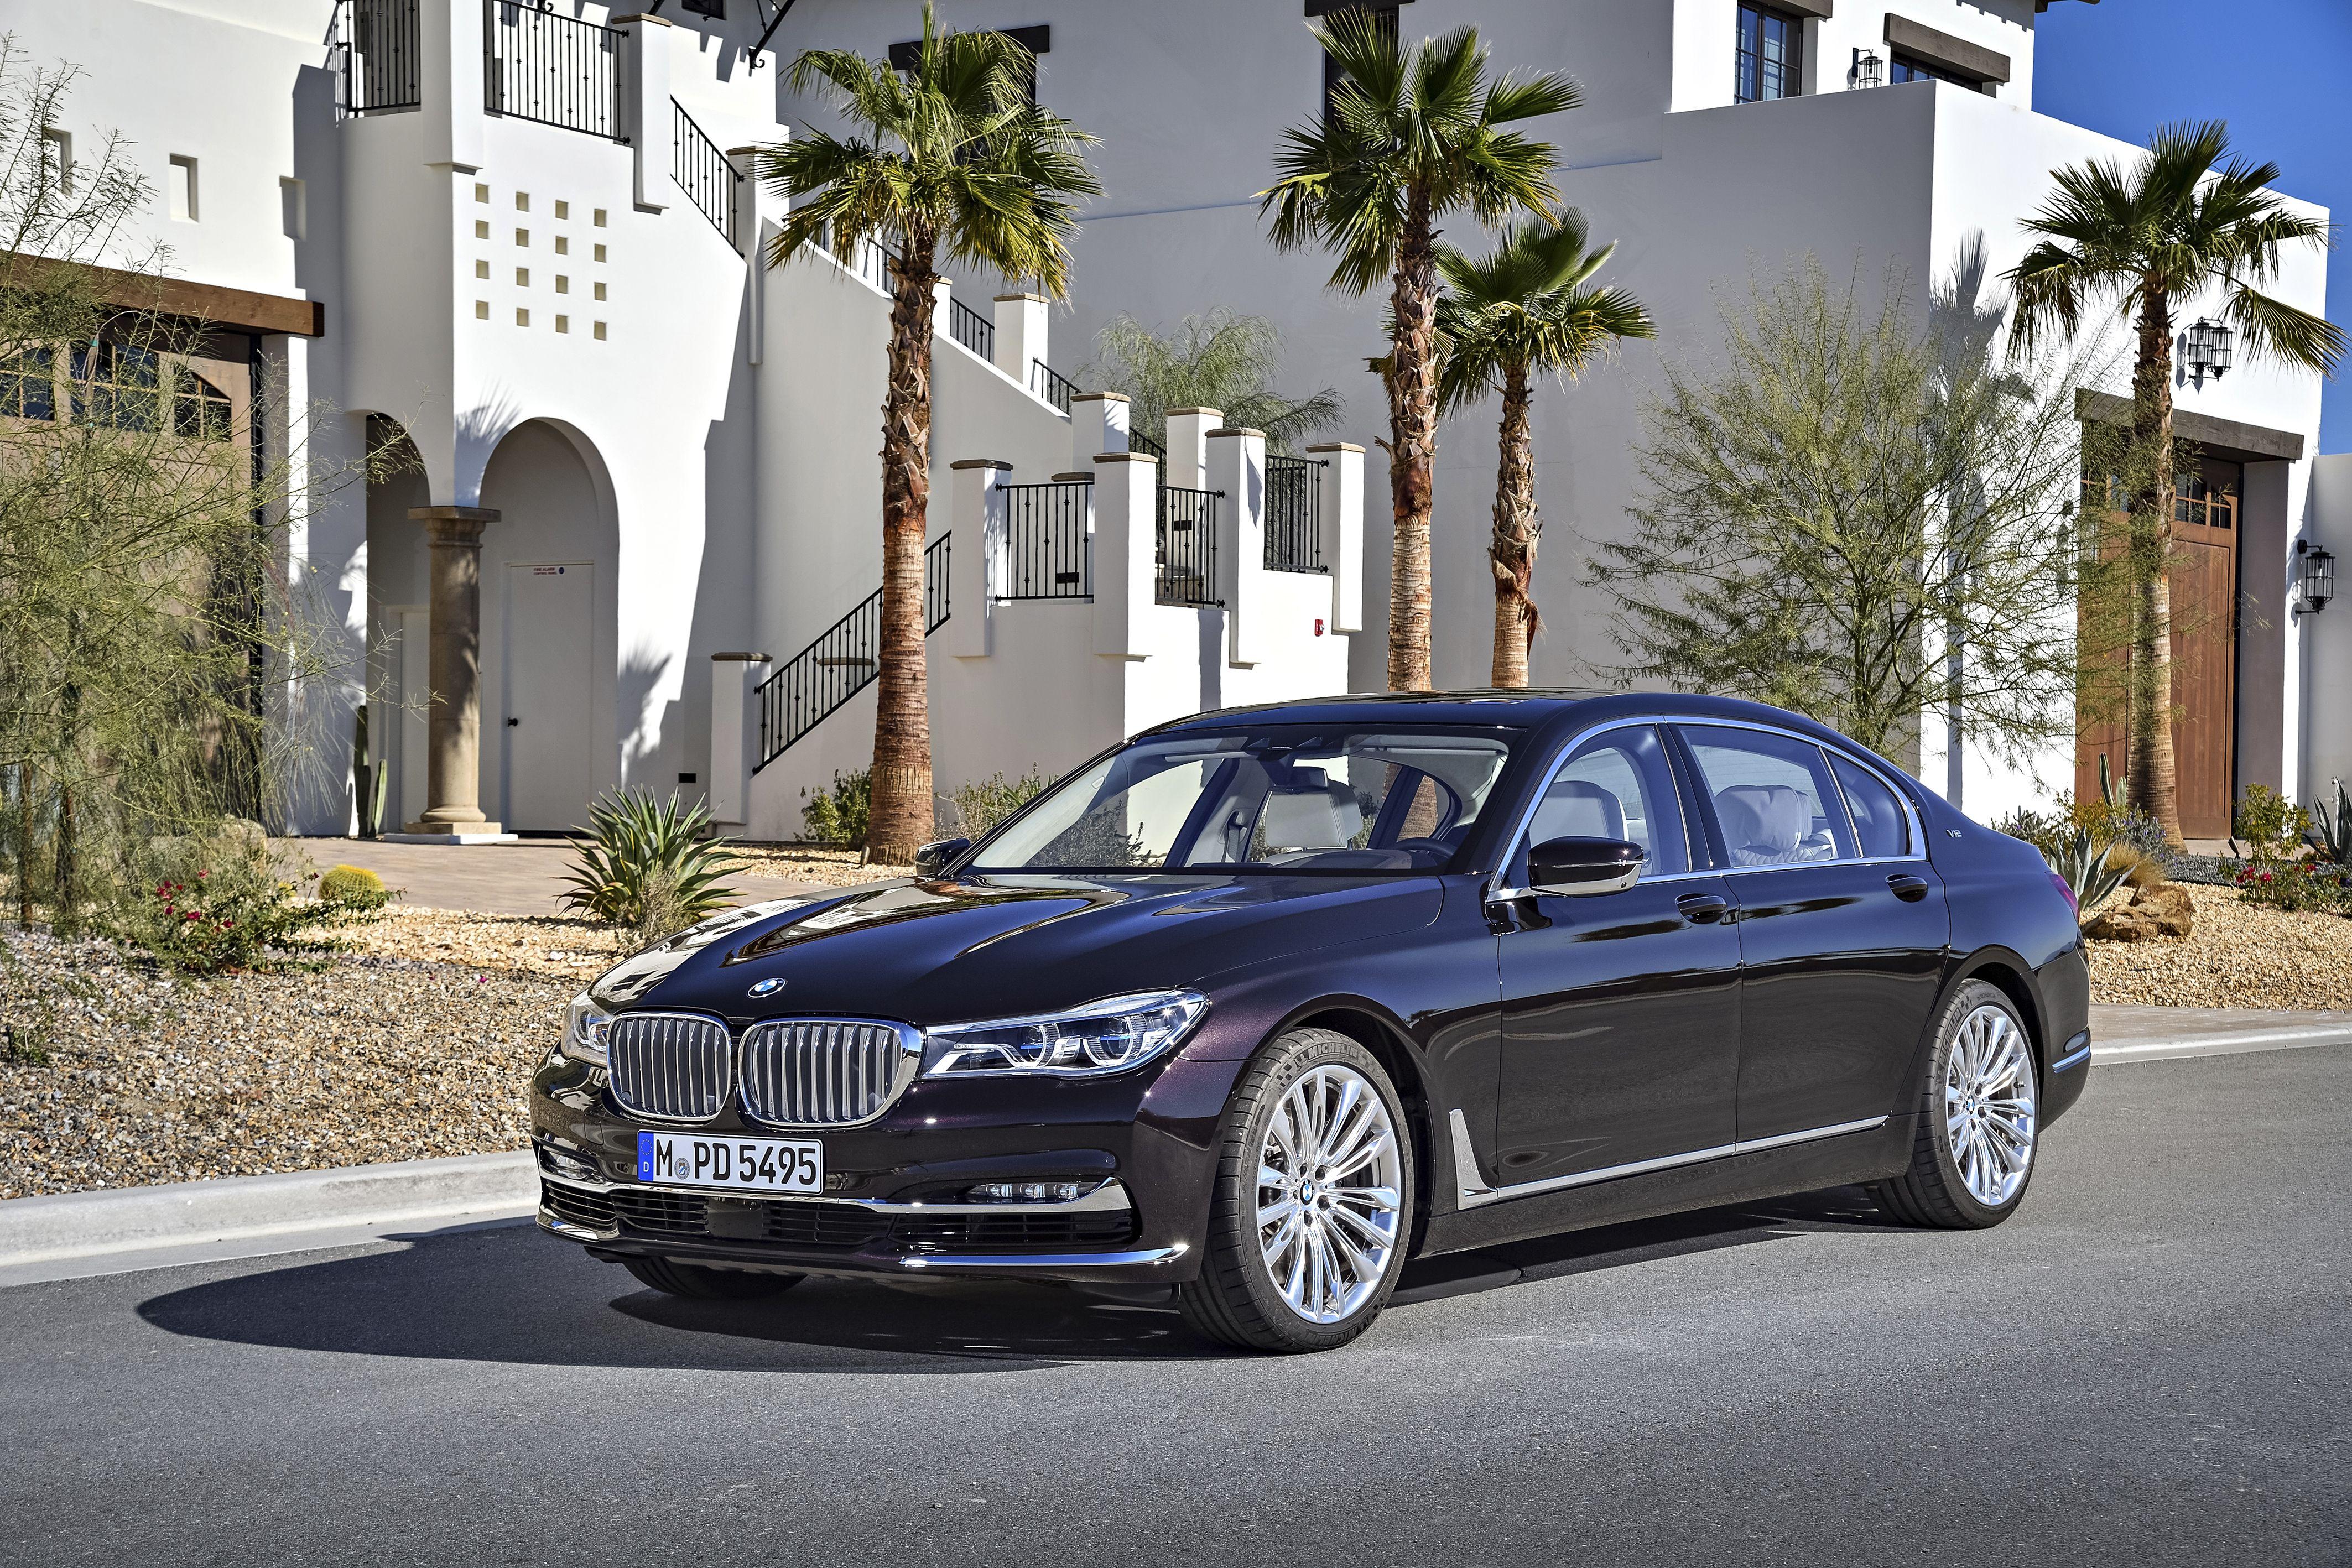 BMW G12 760Li xDrive V12 Sedan Excellence